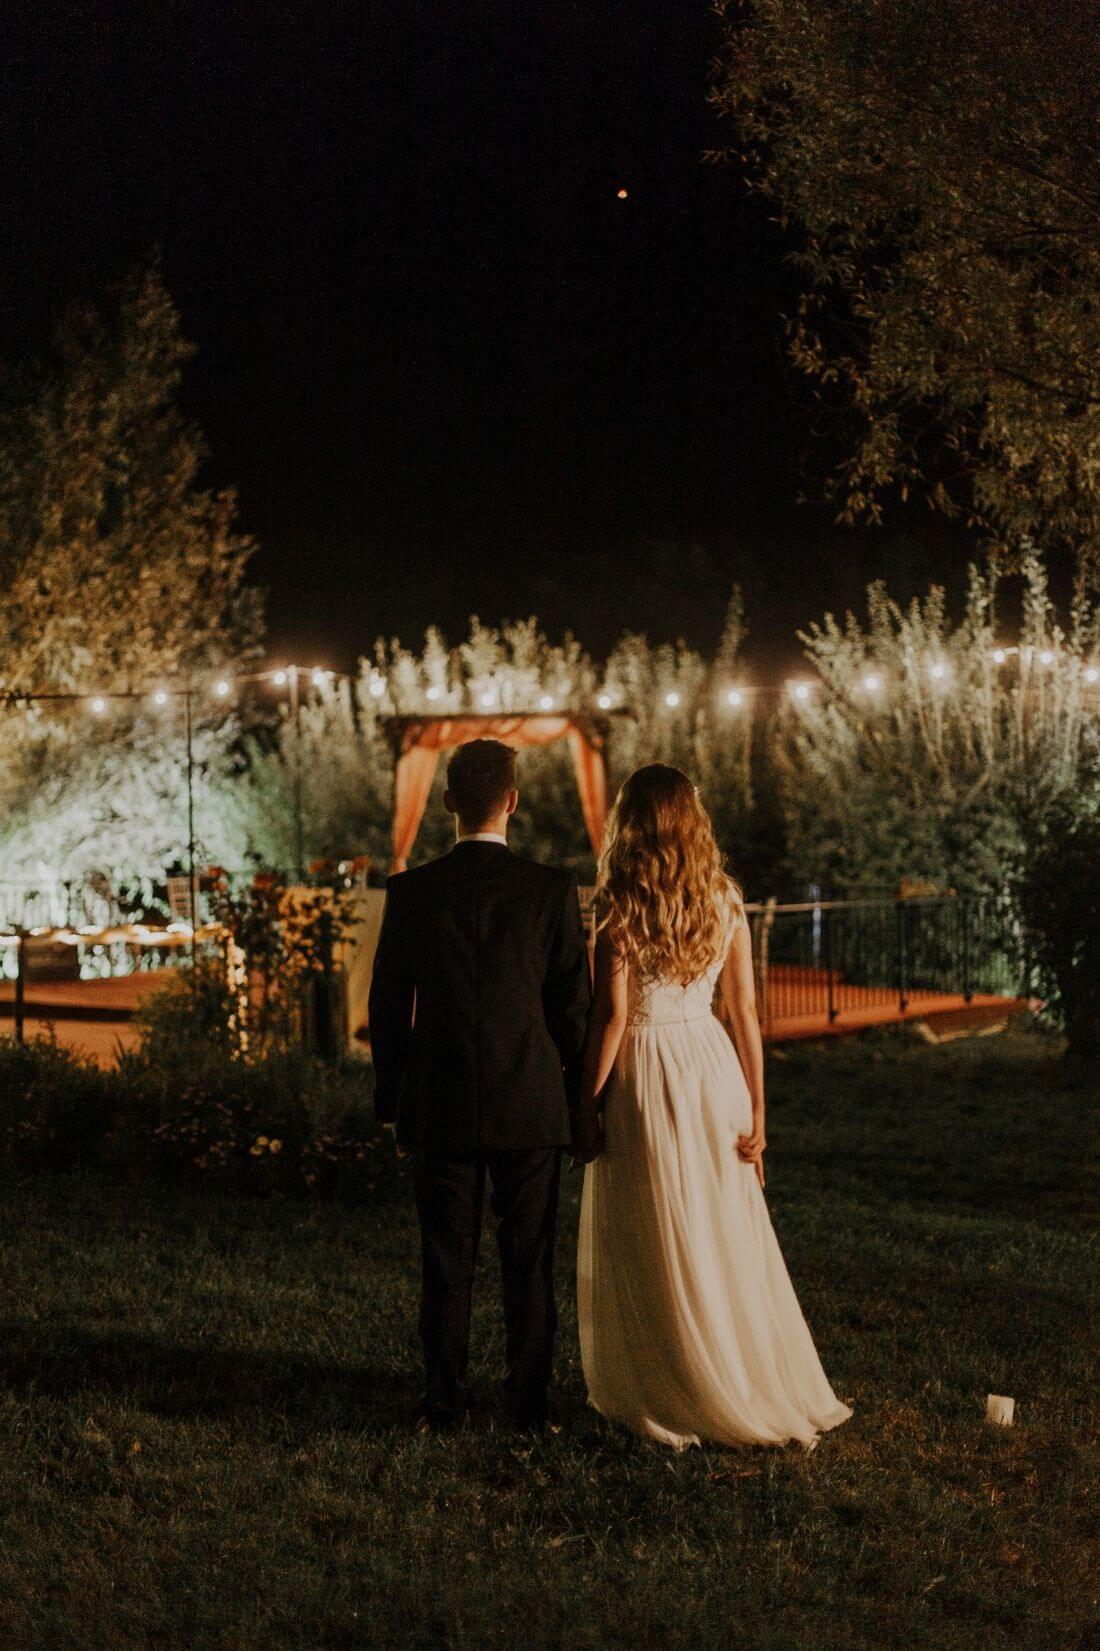 Nunta pe note muzicale – Ana-Maria si Robert – IDO-Weddings-nuntiinaerliber (3)